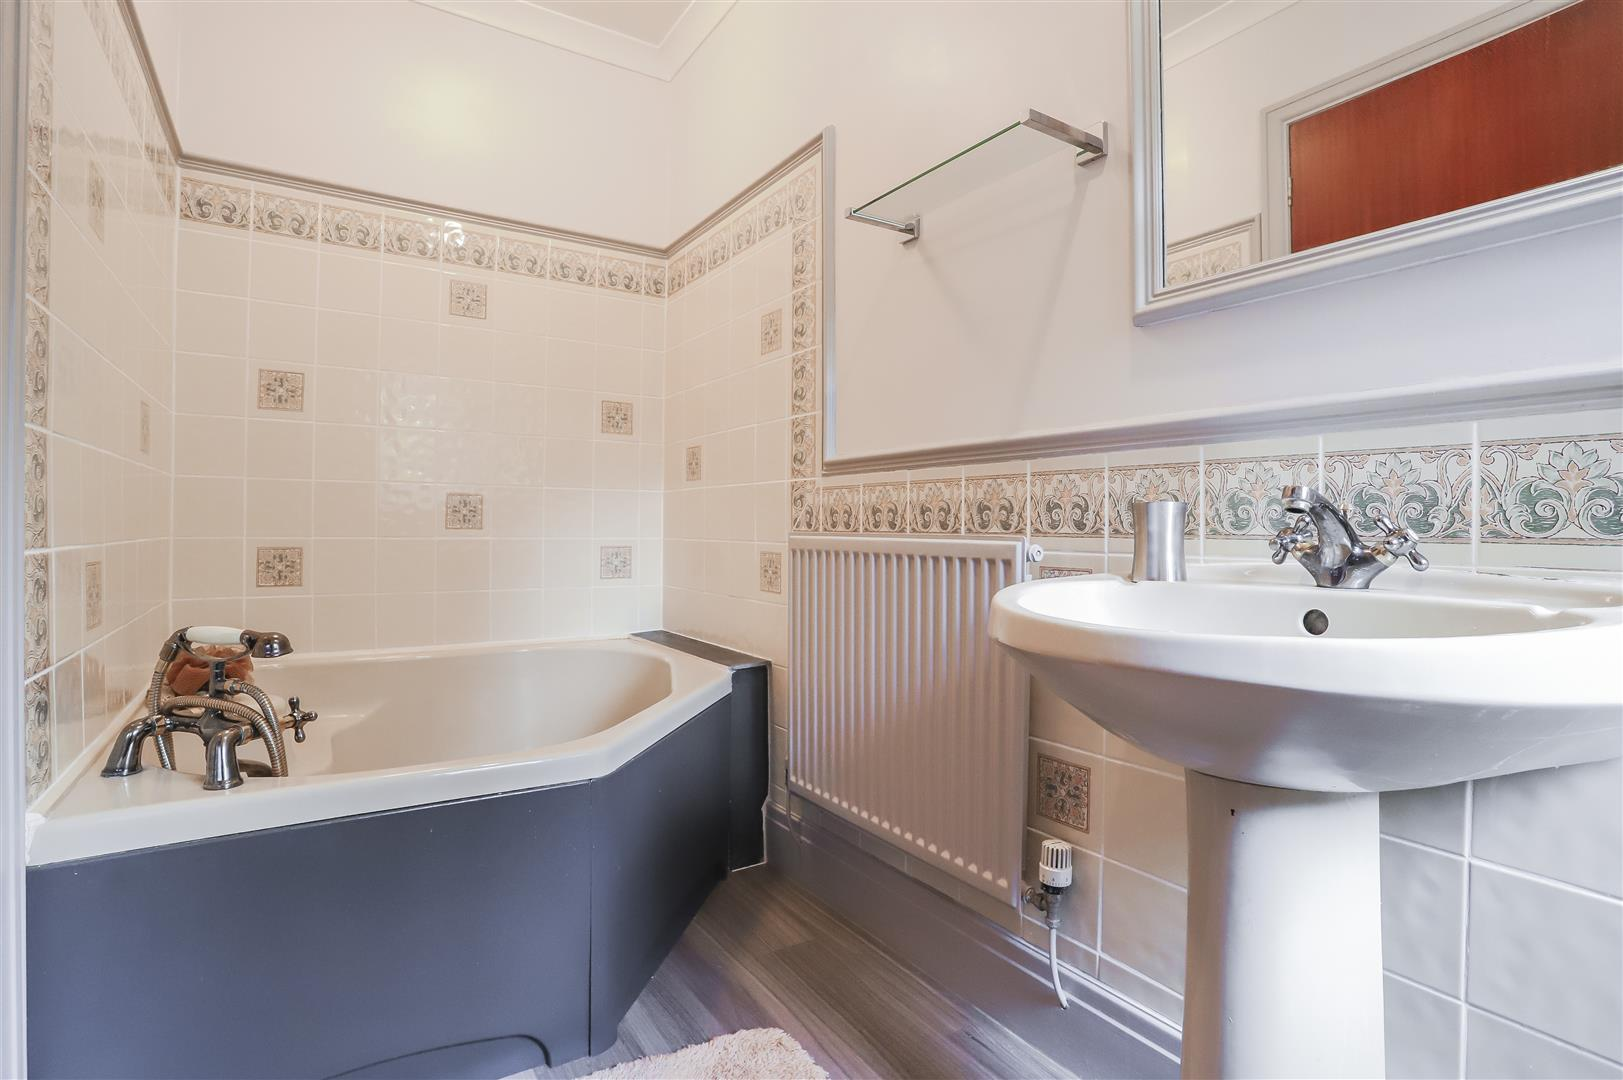 4 Bedroom Detached House For Sale - Image 54